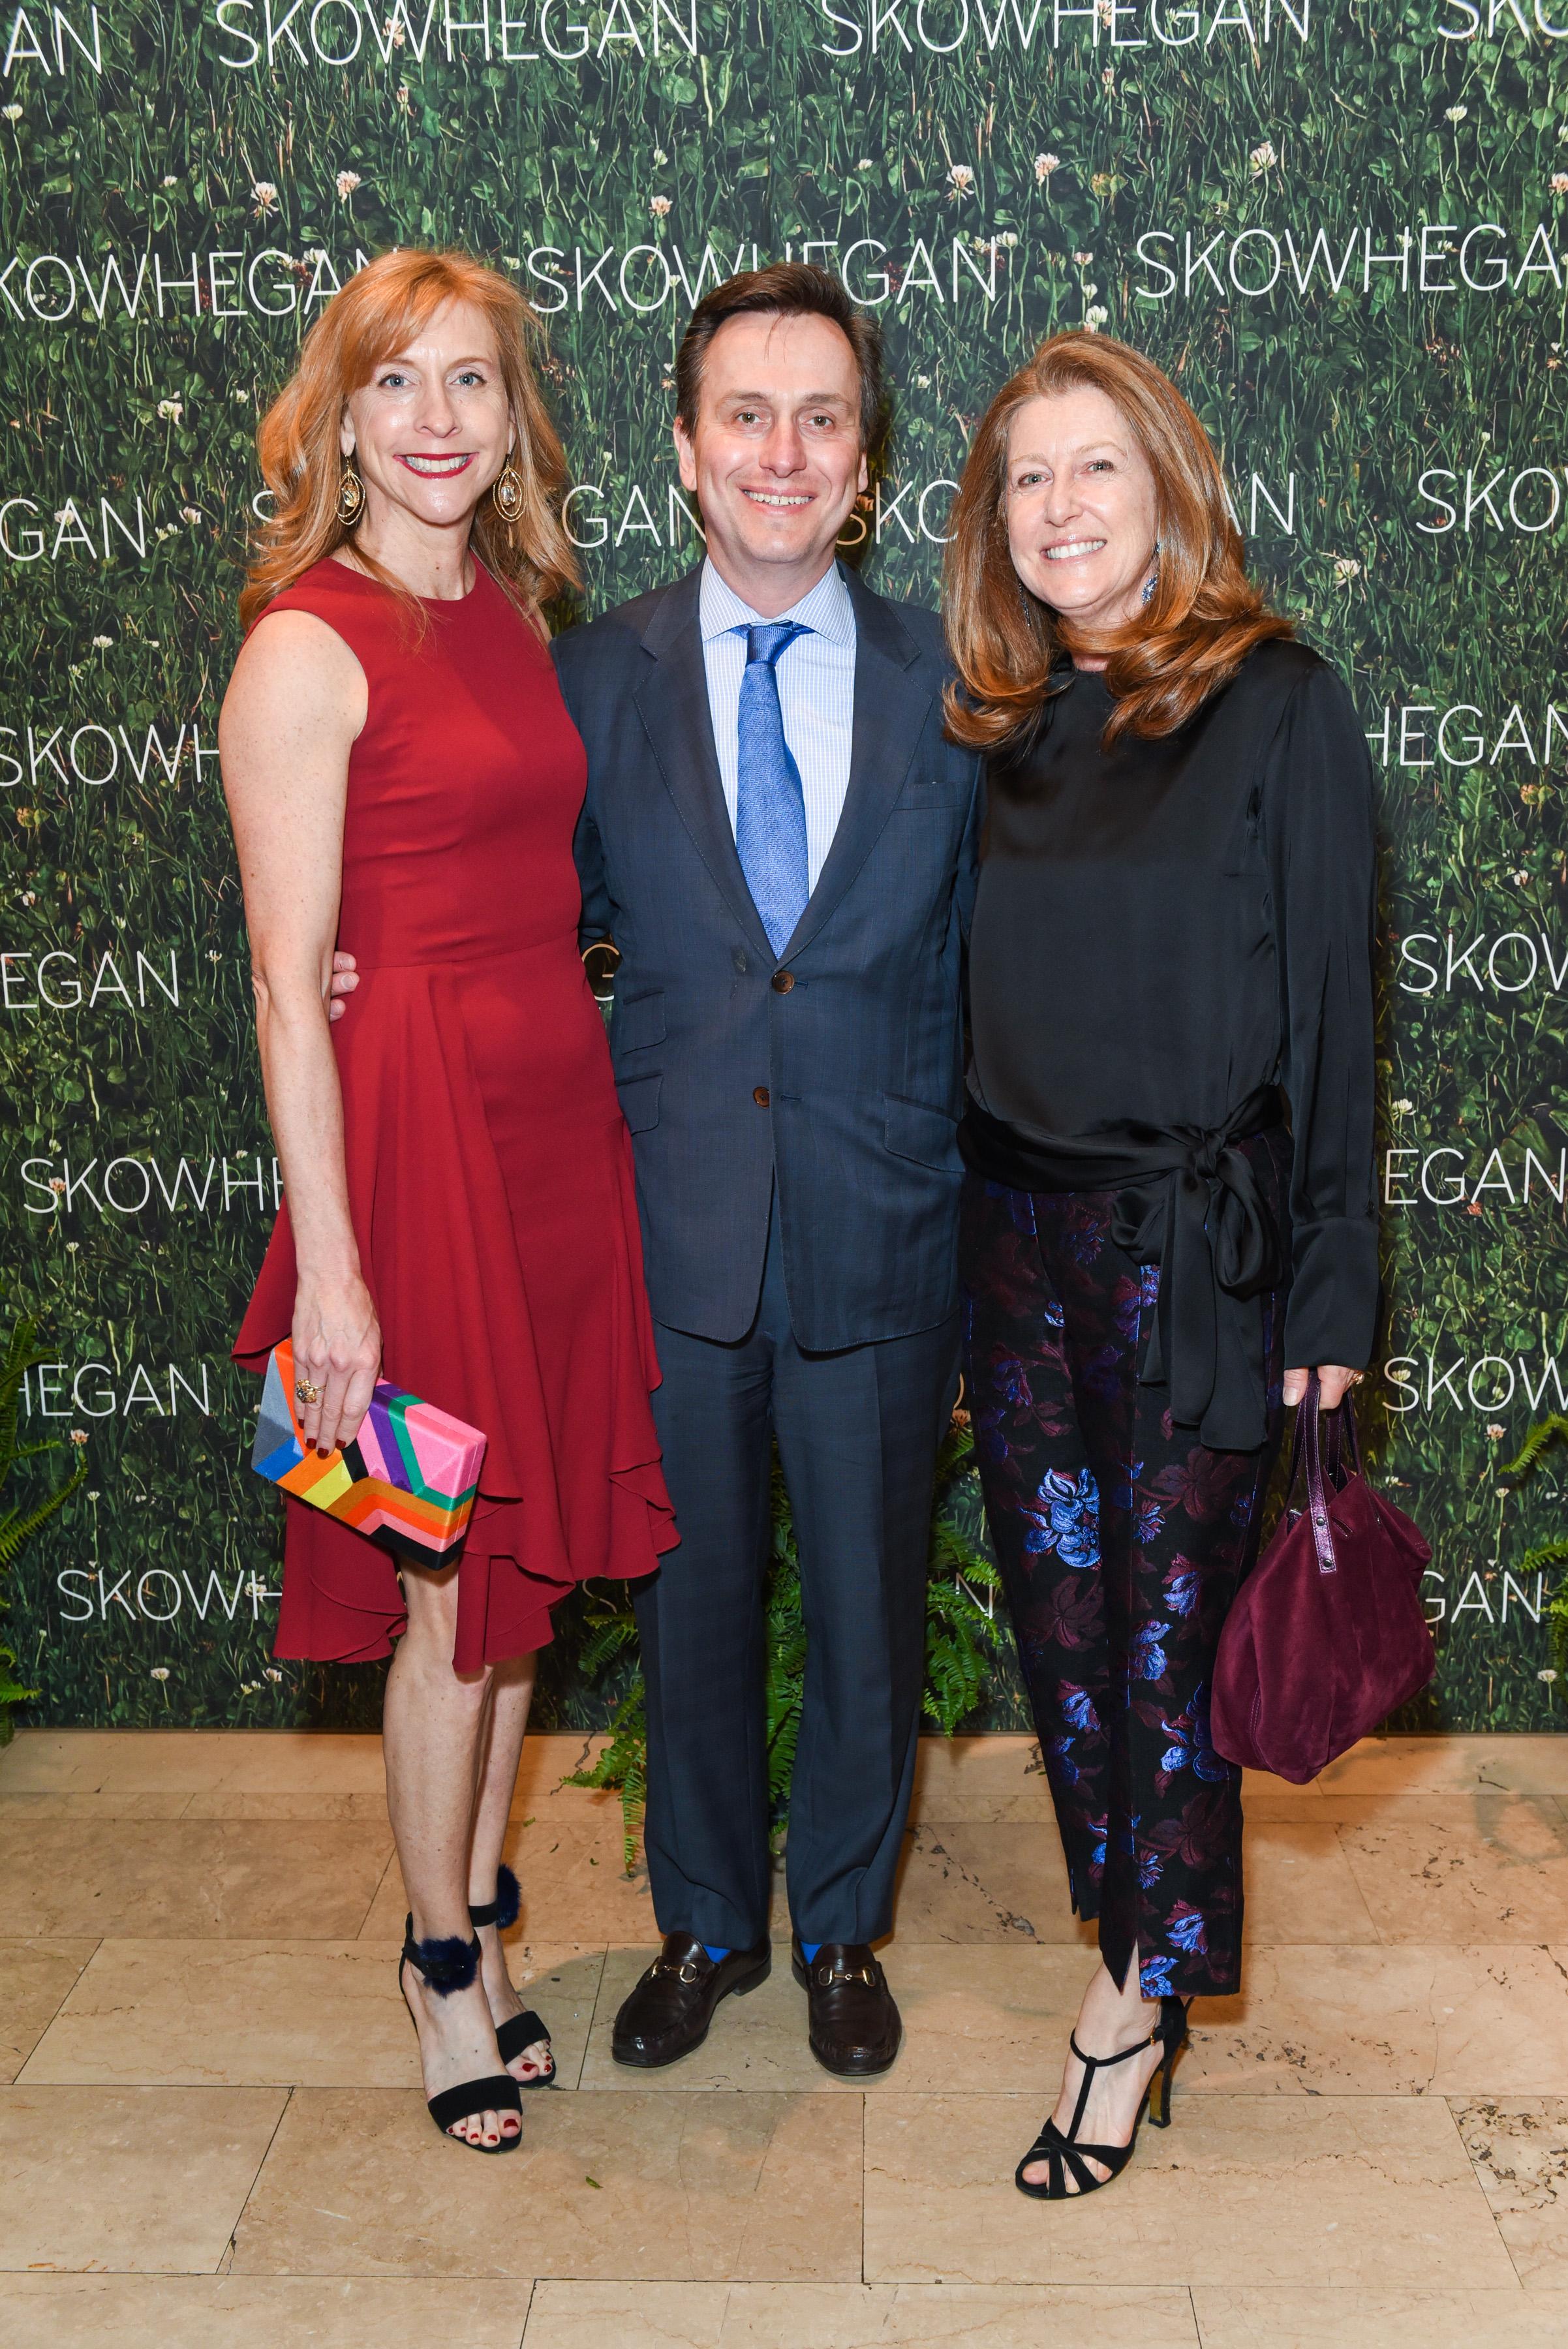 Victoria Love Samueloff, Uri Samueloff, Stephanie Hunt==Skowhegan Awards Dinner 2018==The Plaza Hotel, New York, NY==April 24, 2018==�Patrick McMullan==Photo - Presley Ann/PMC====